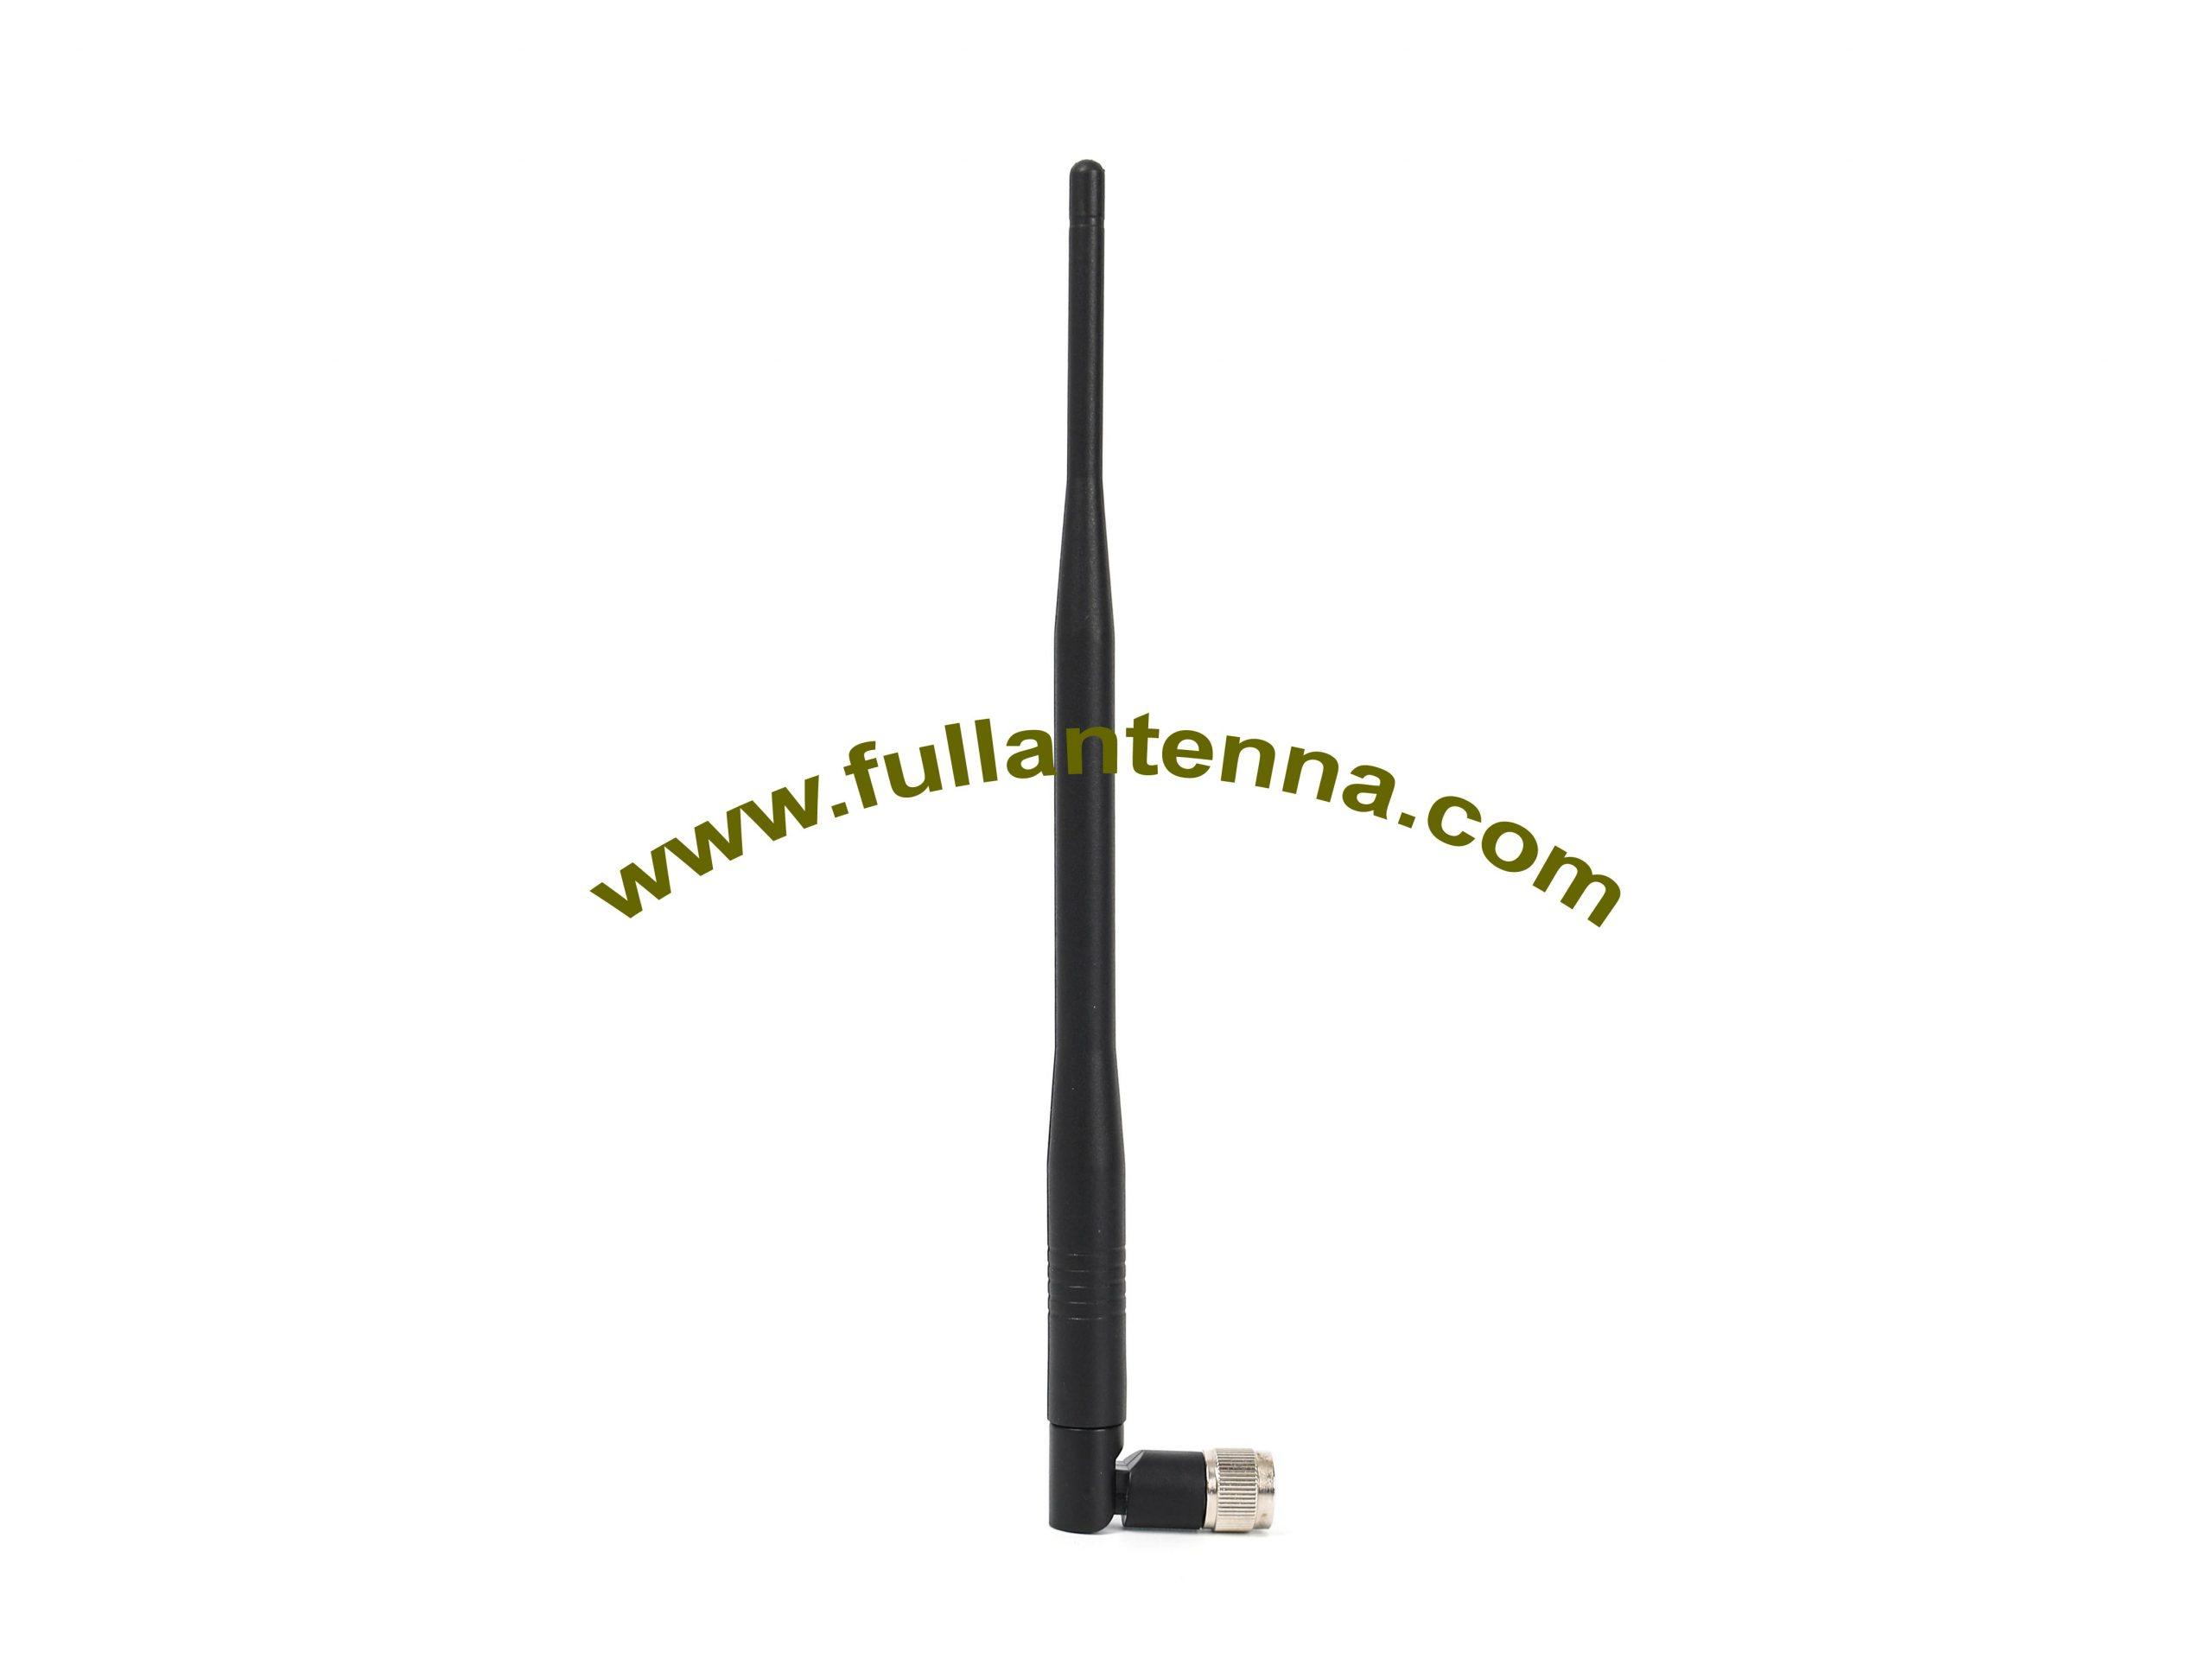 P/N:FA2400.0507,WiFi/2.4G Rubber Antenna,7dBi 2400mhz antenna,SMA male